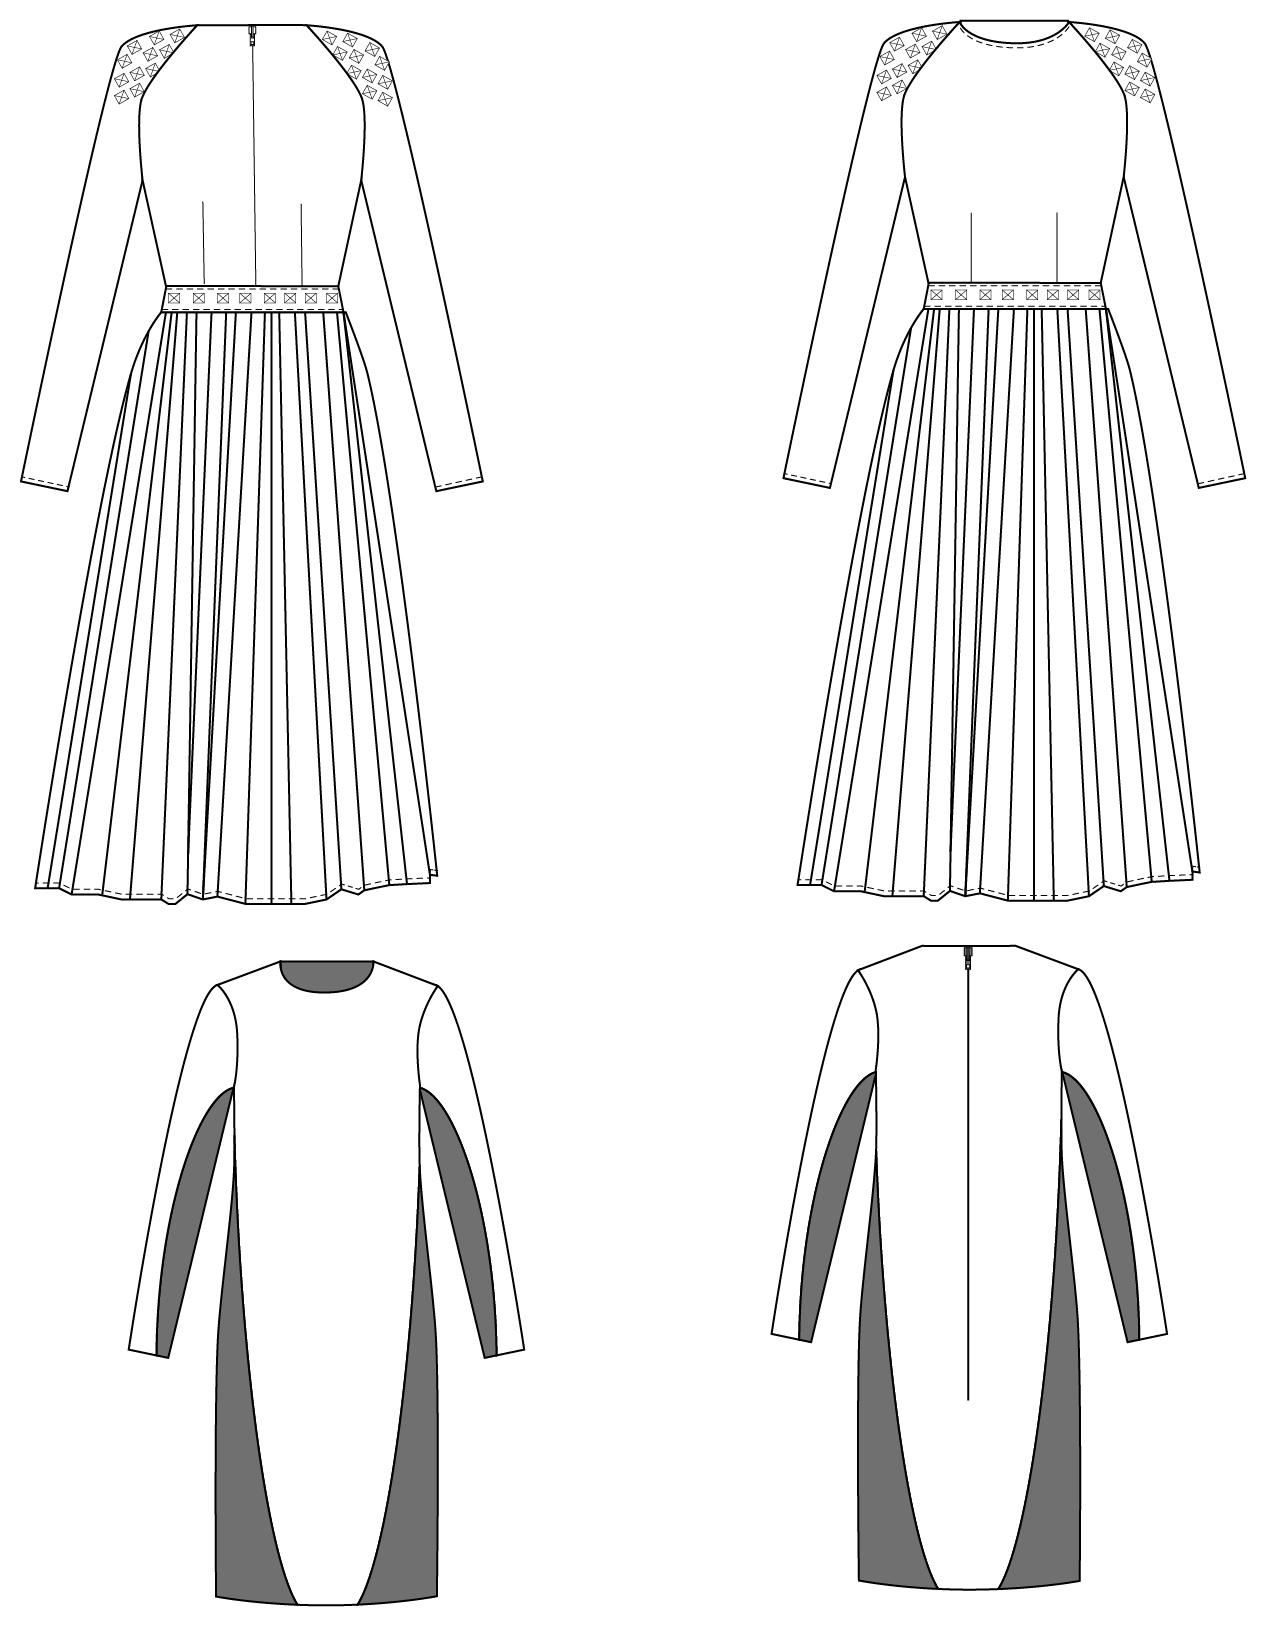 fashion-illustrations-06.jpg